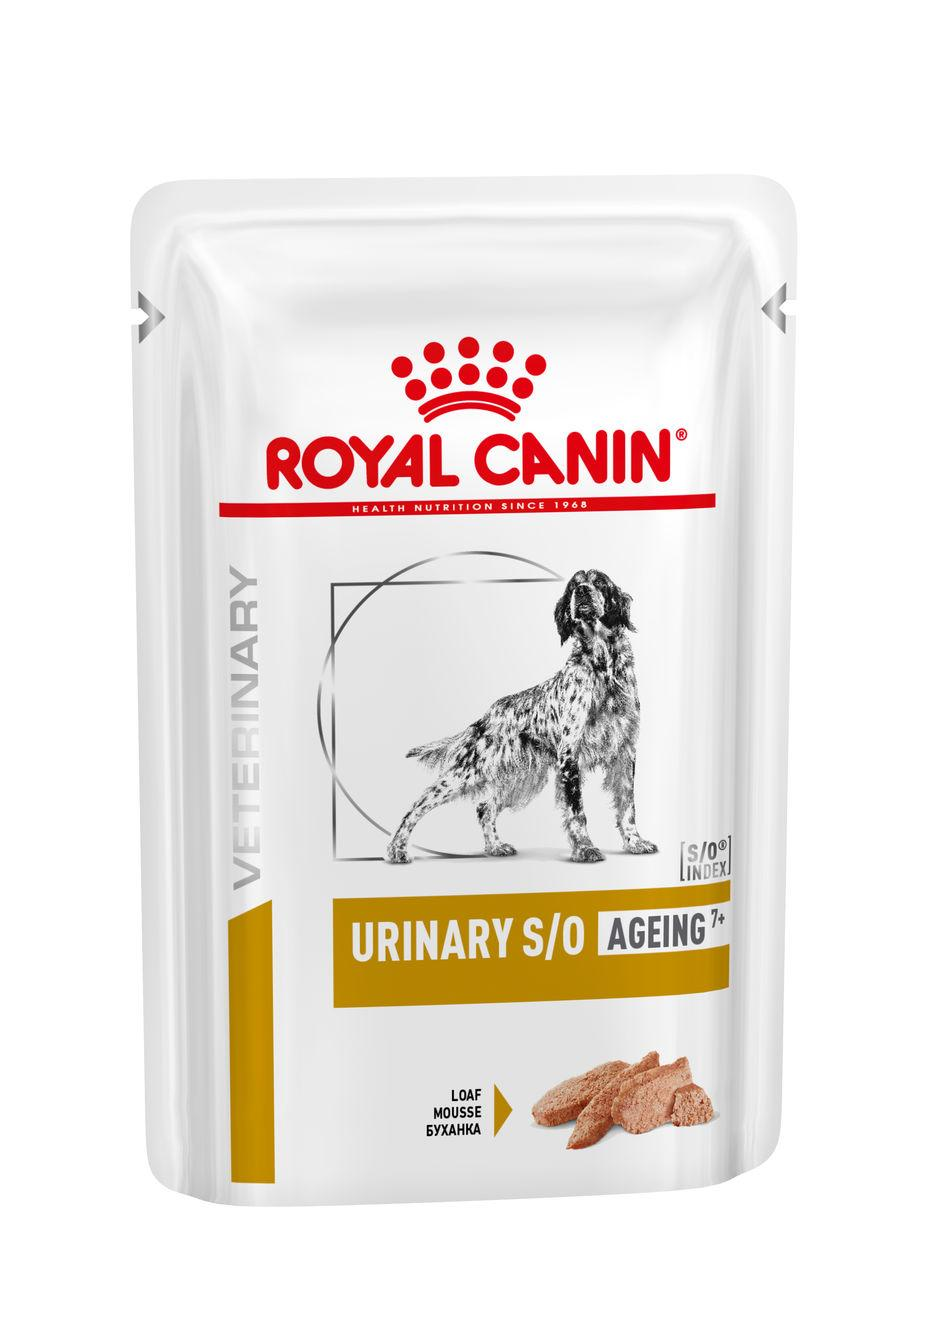 Royal canin veterinary health nutrition dog  urinary s/o age pouch loaf kapsa 85g